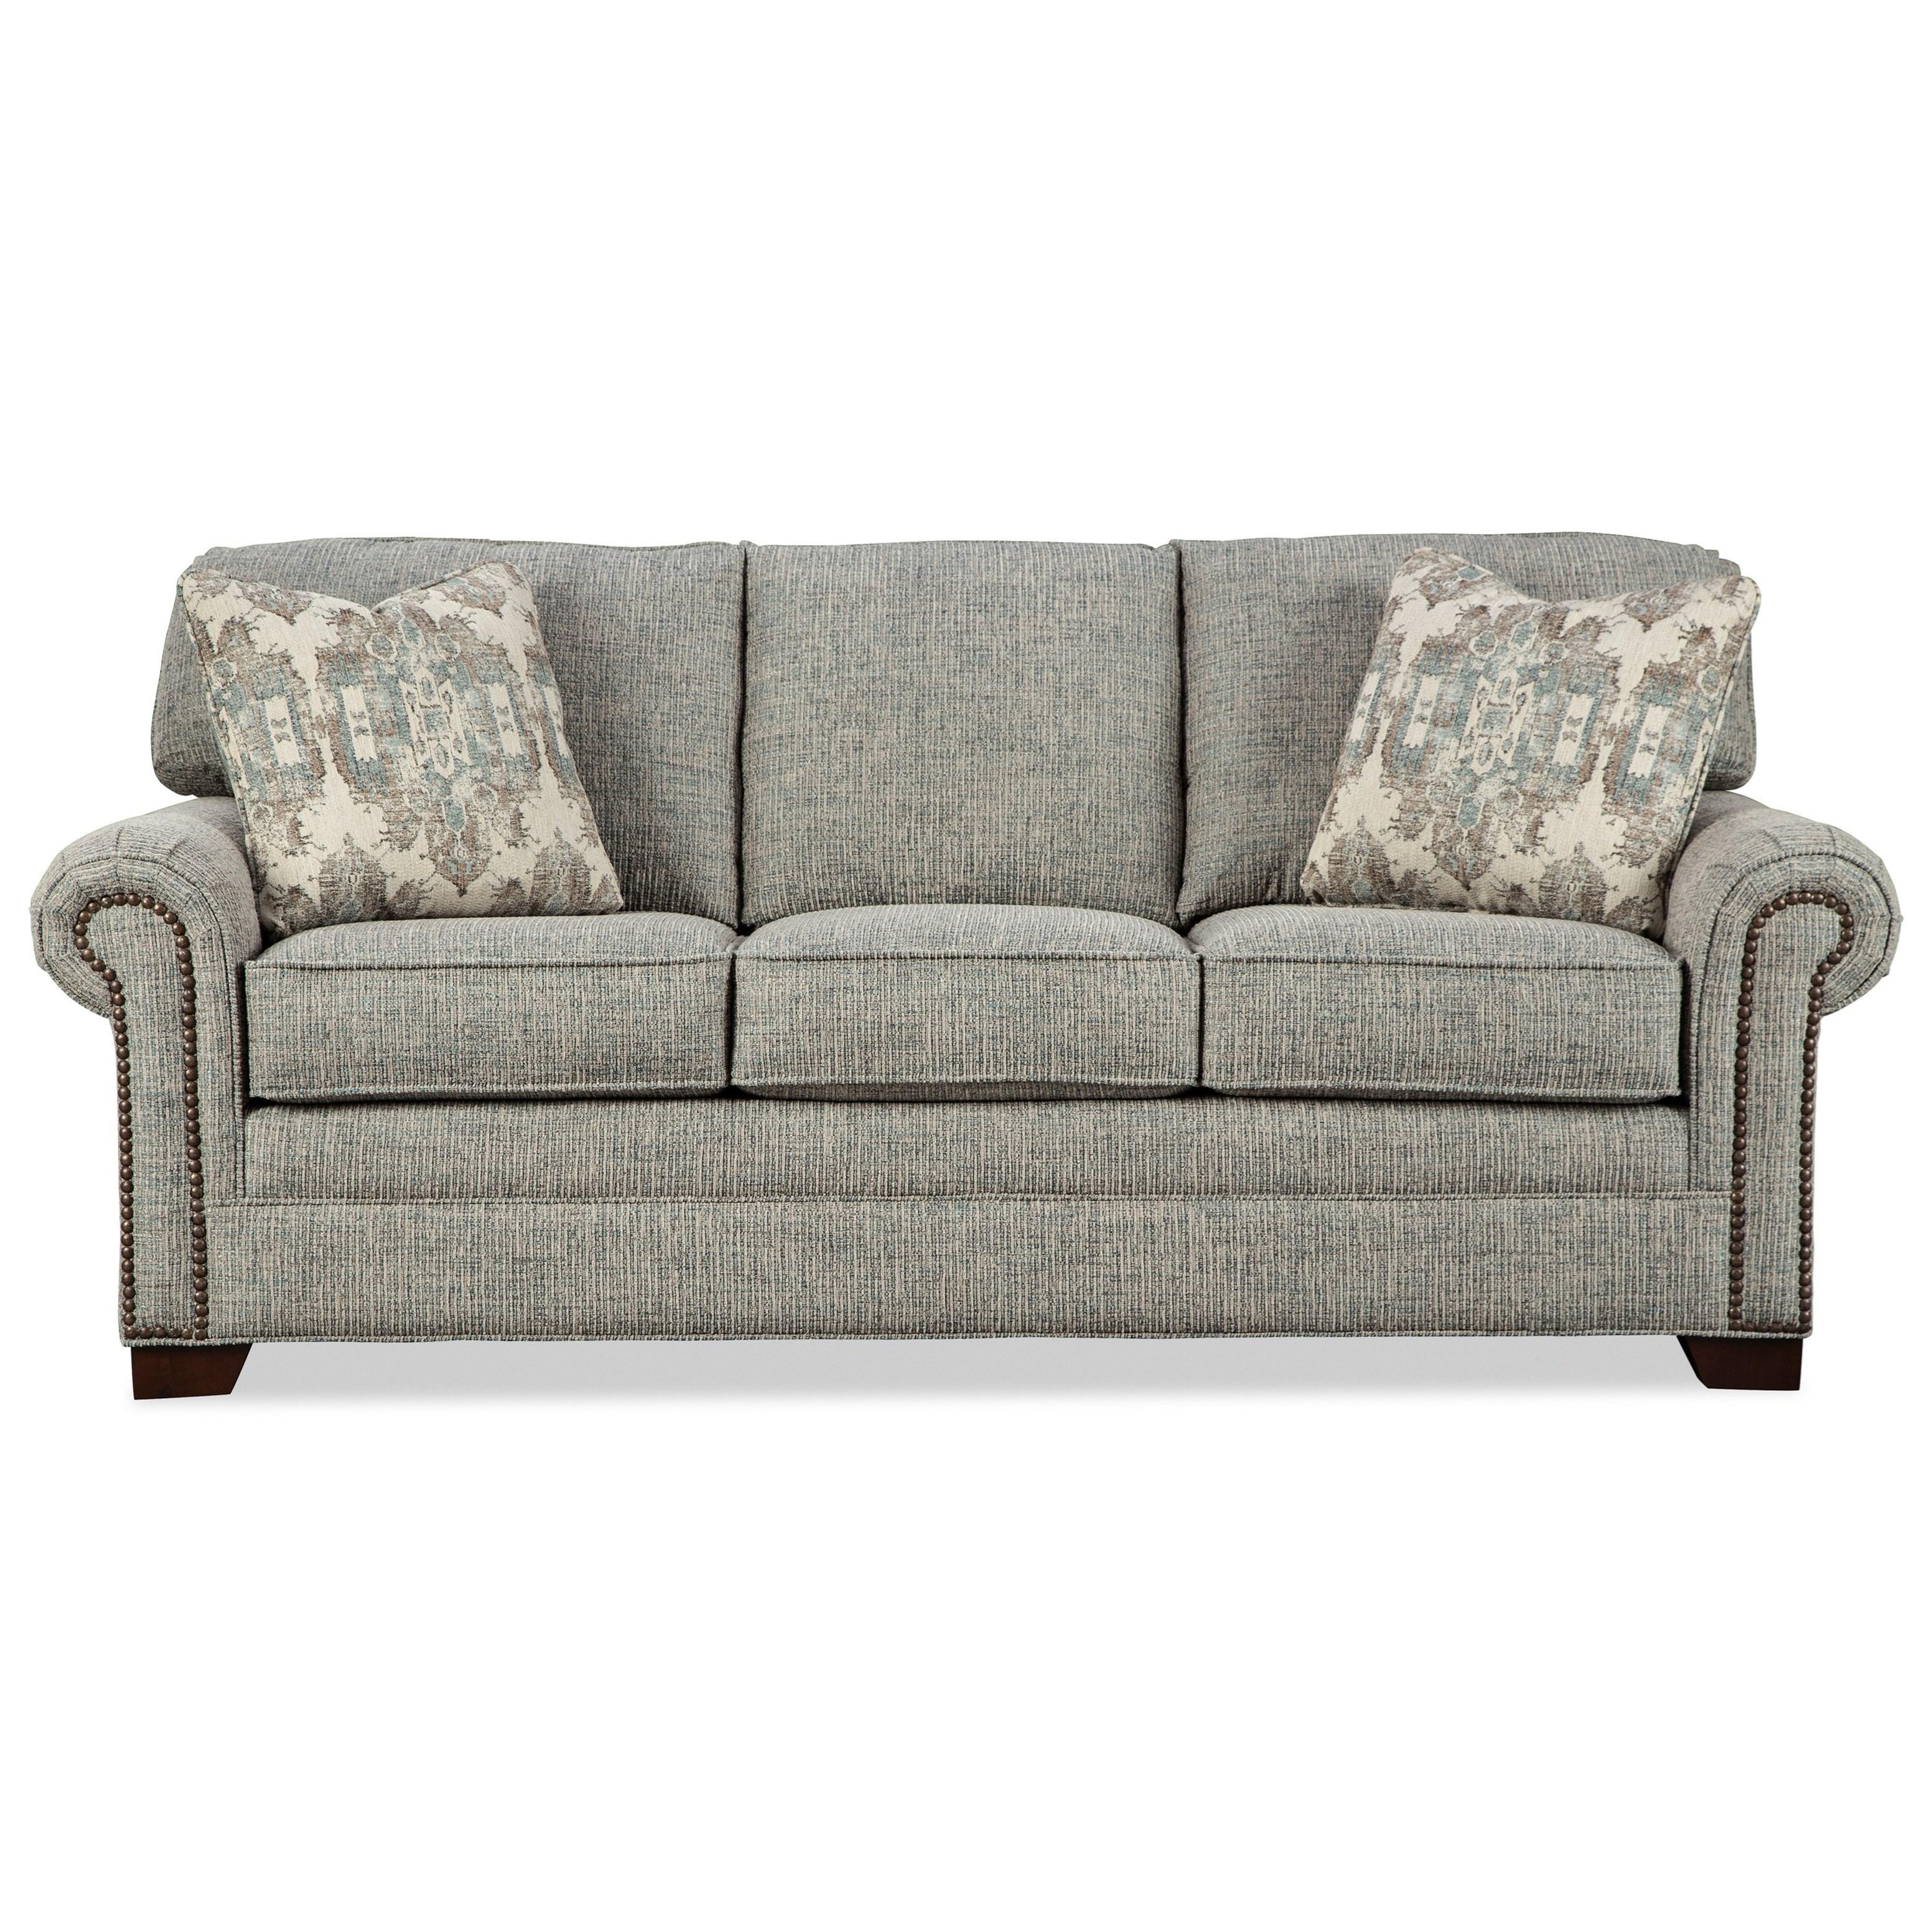 Transitional Sleeper Sofa with Brass Nailheads and Memory Foam Mattress